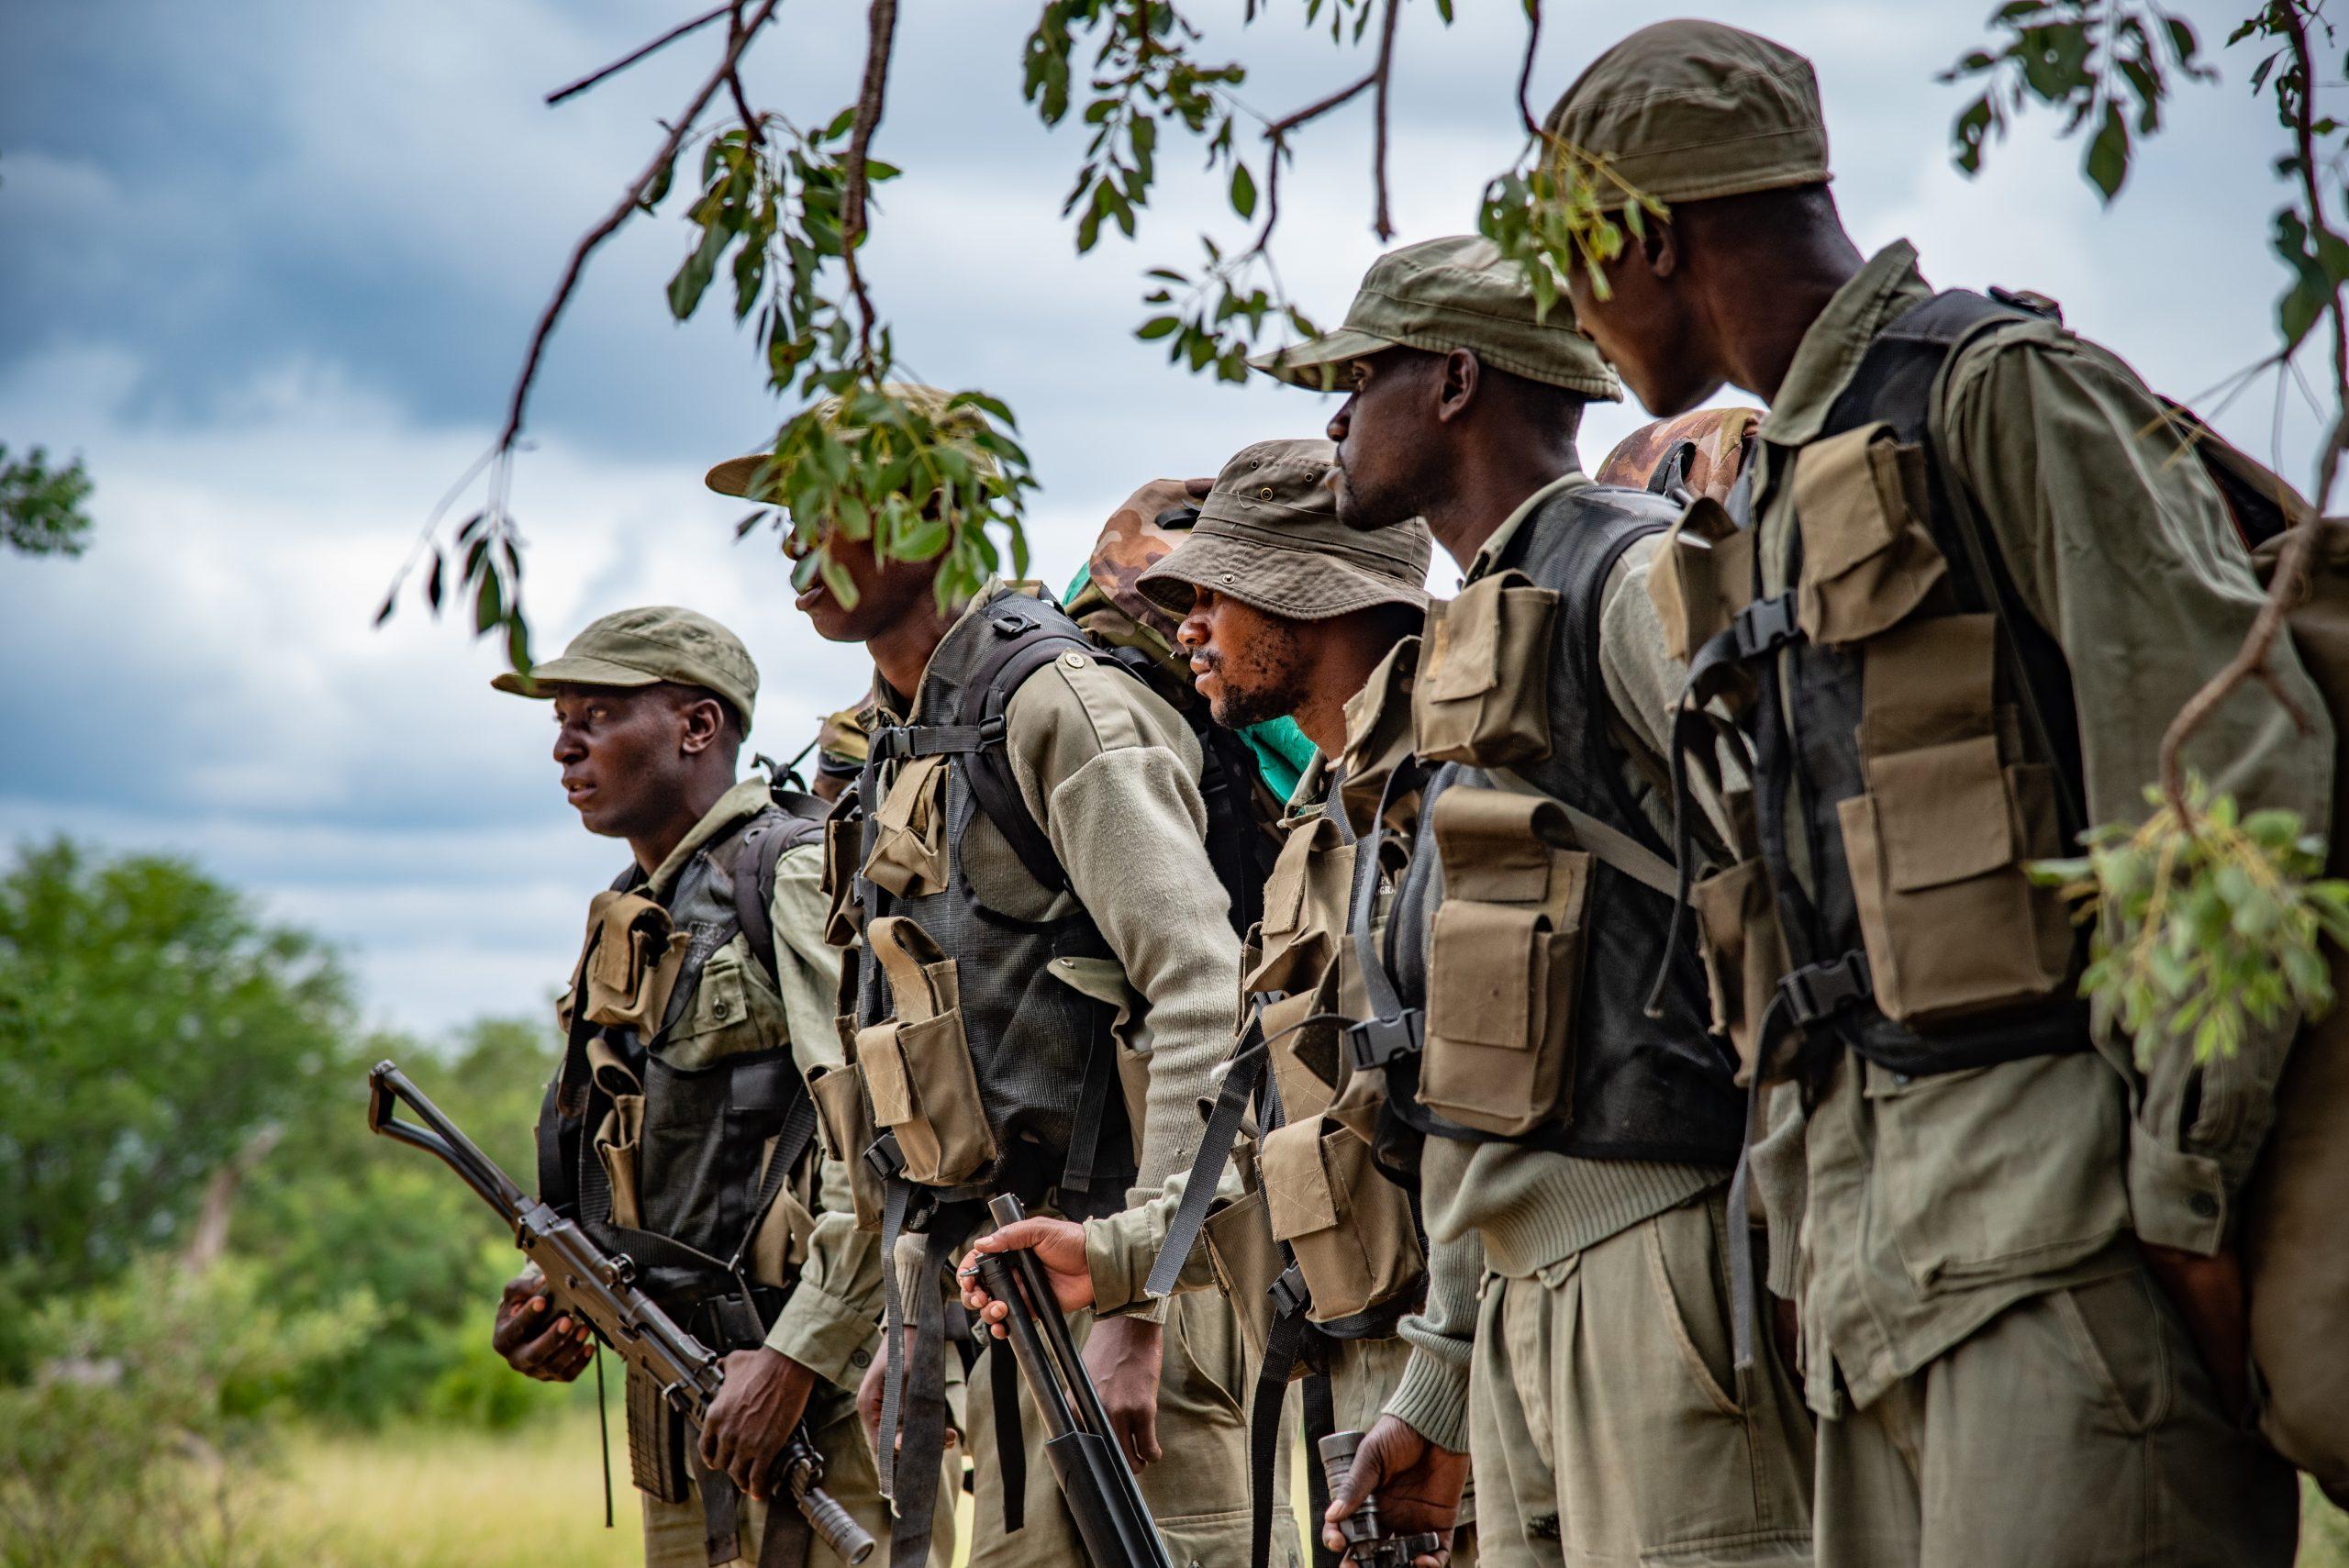 Limpopo National Park – Peace Parks Foundation